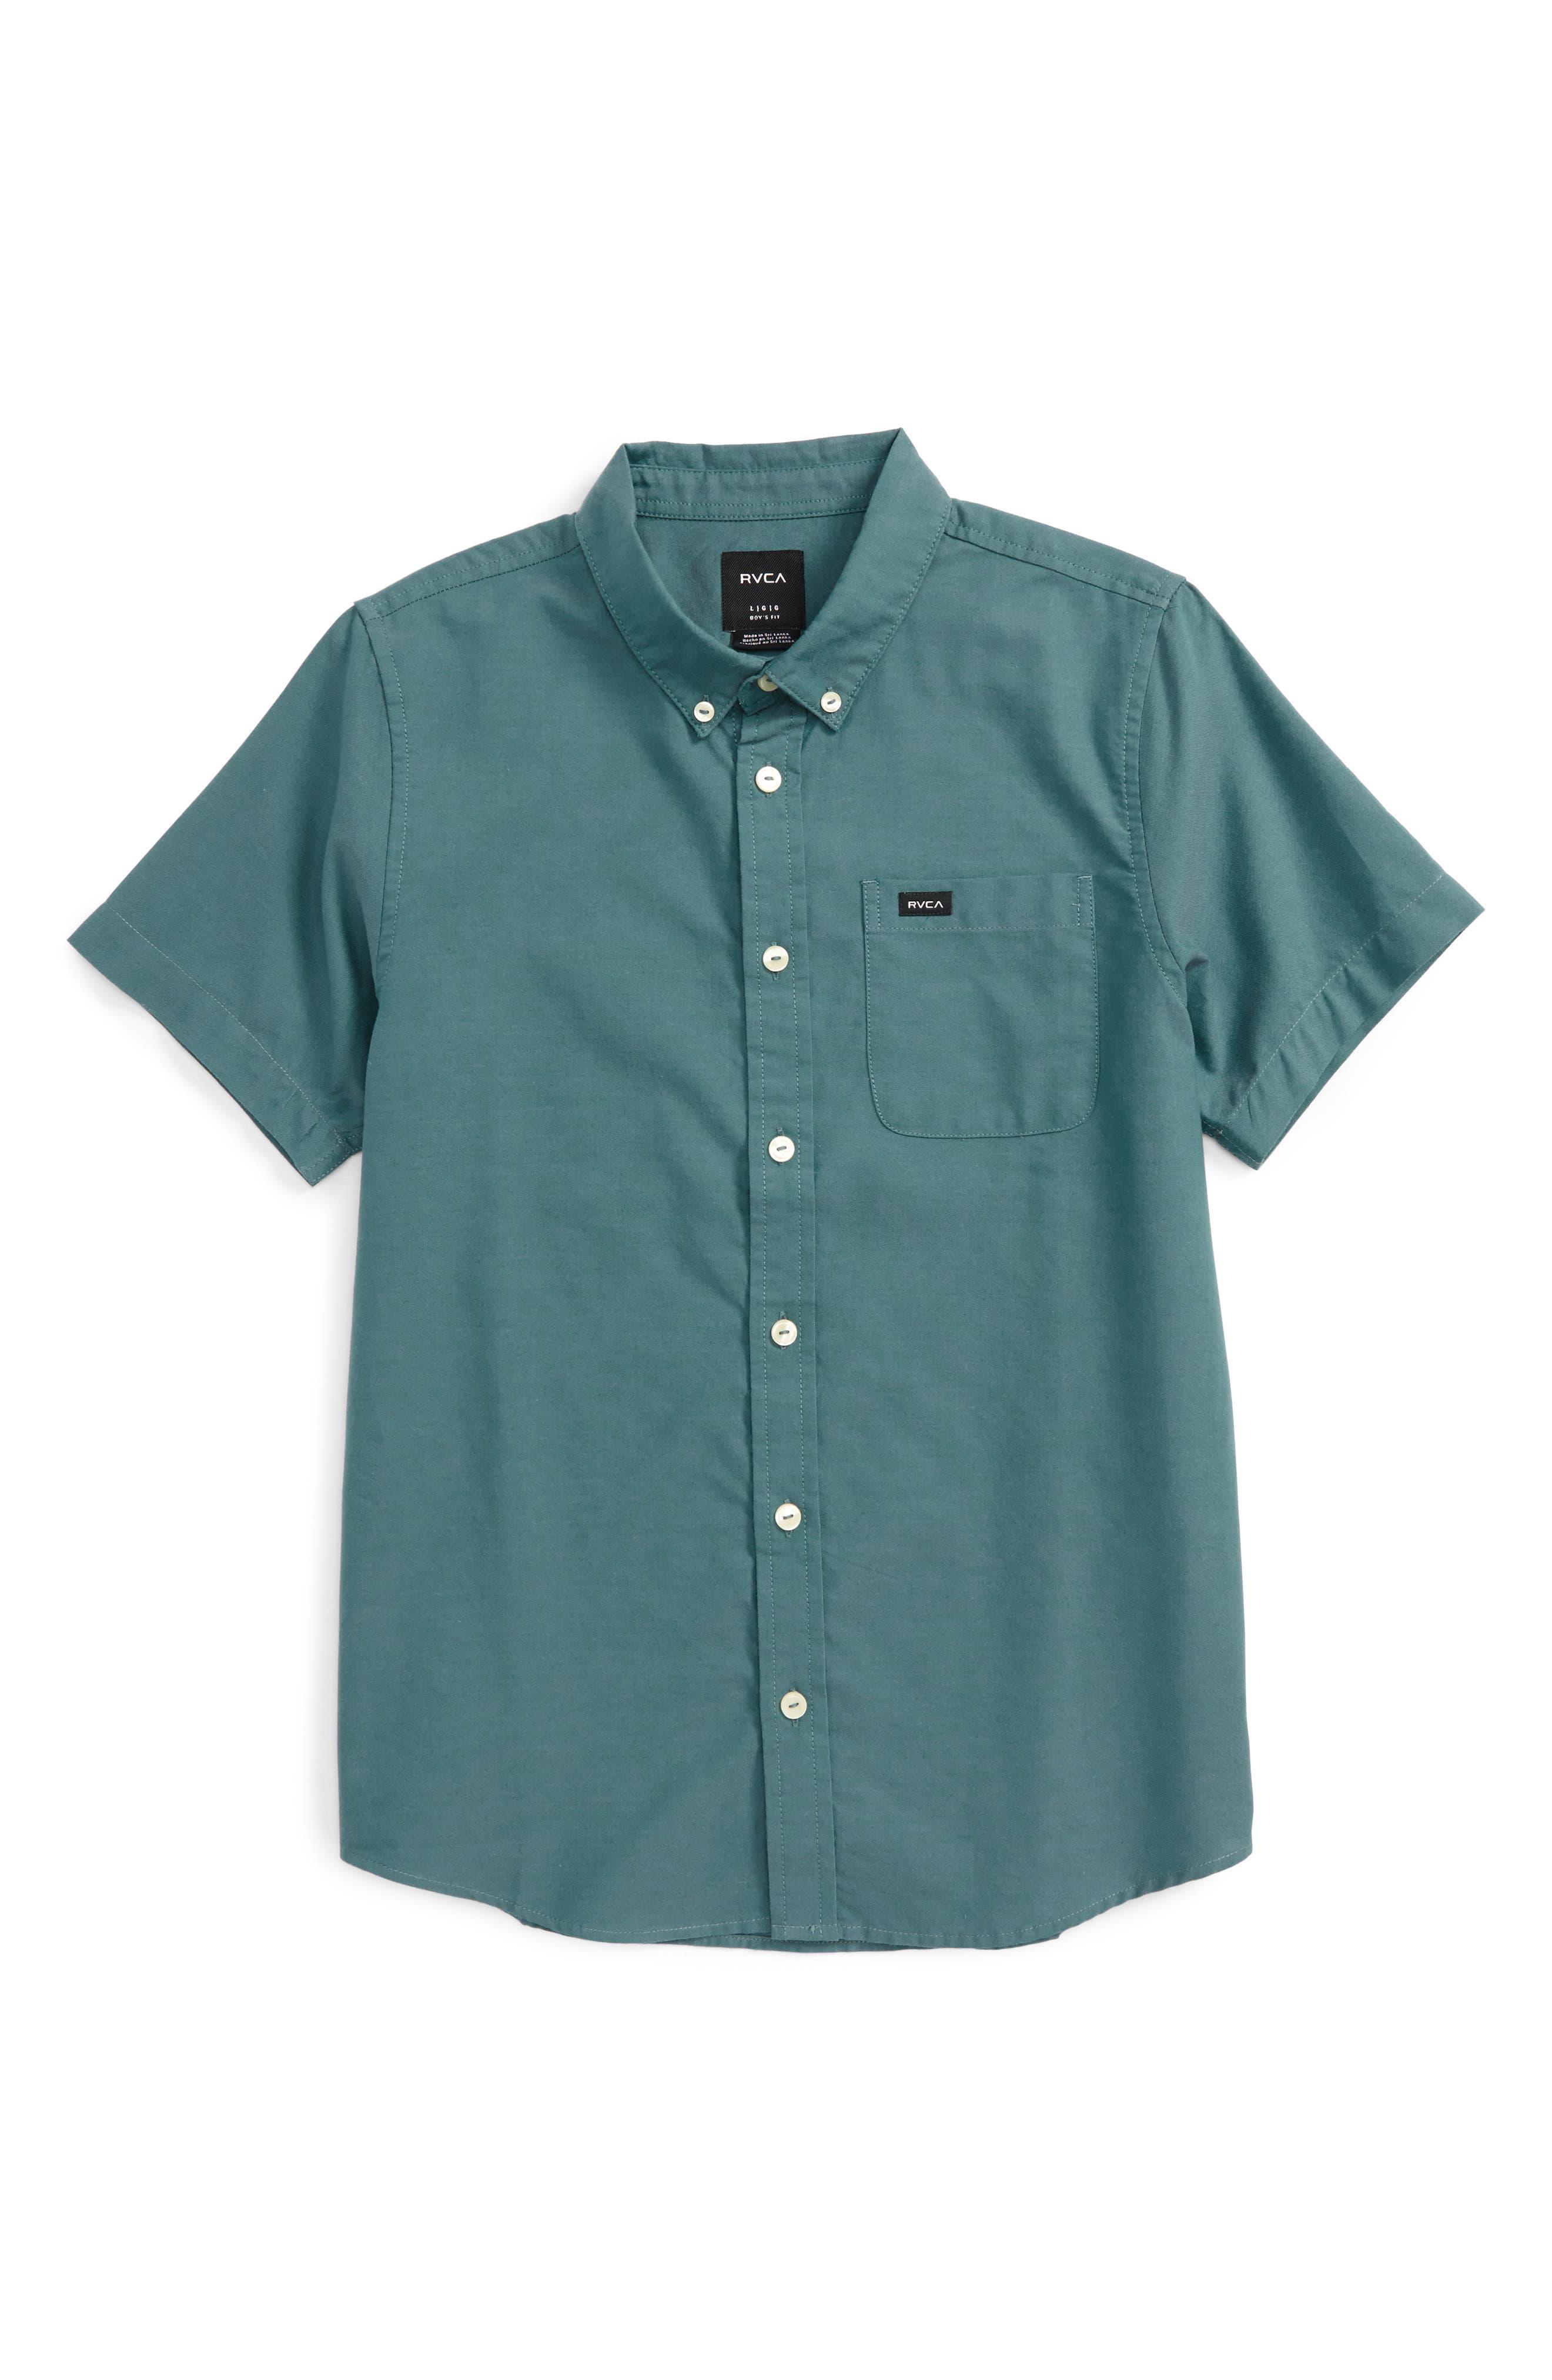 'That'll Do' Woven Shirt,                             Main thumbnail 2, color,